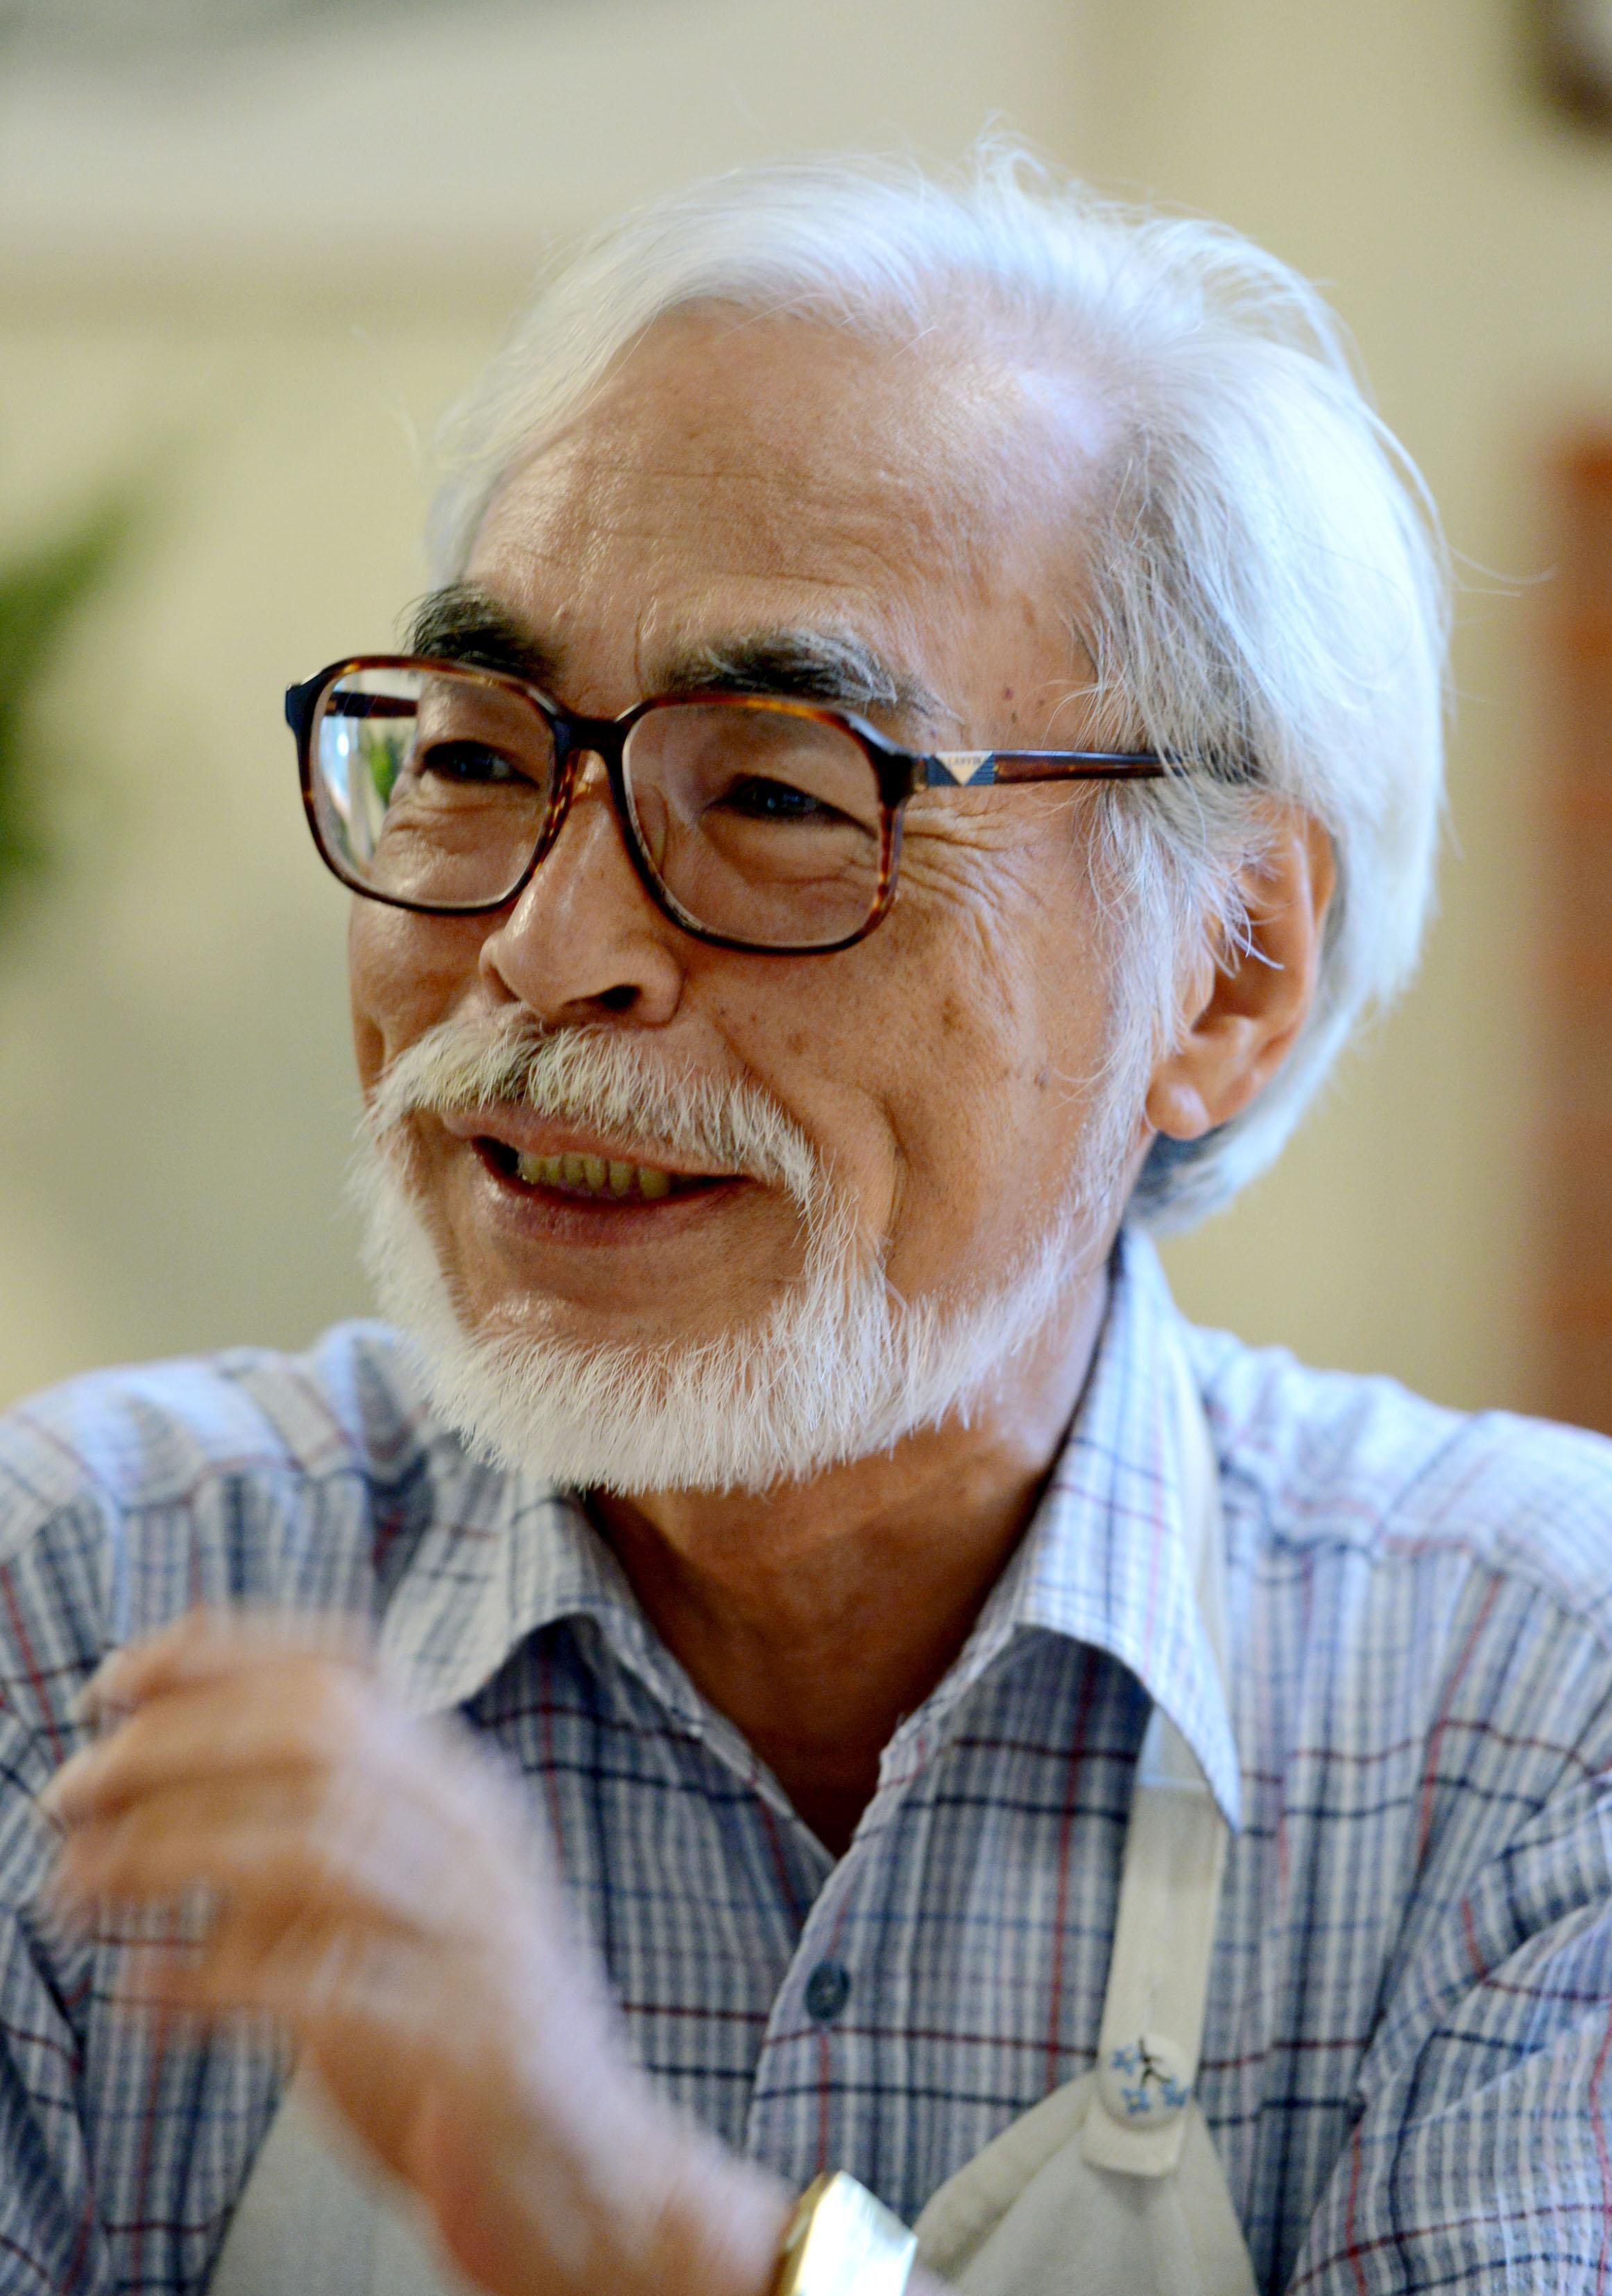 HQ Hayao Miyazaki Wallpapers | File 787.34Kb